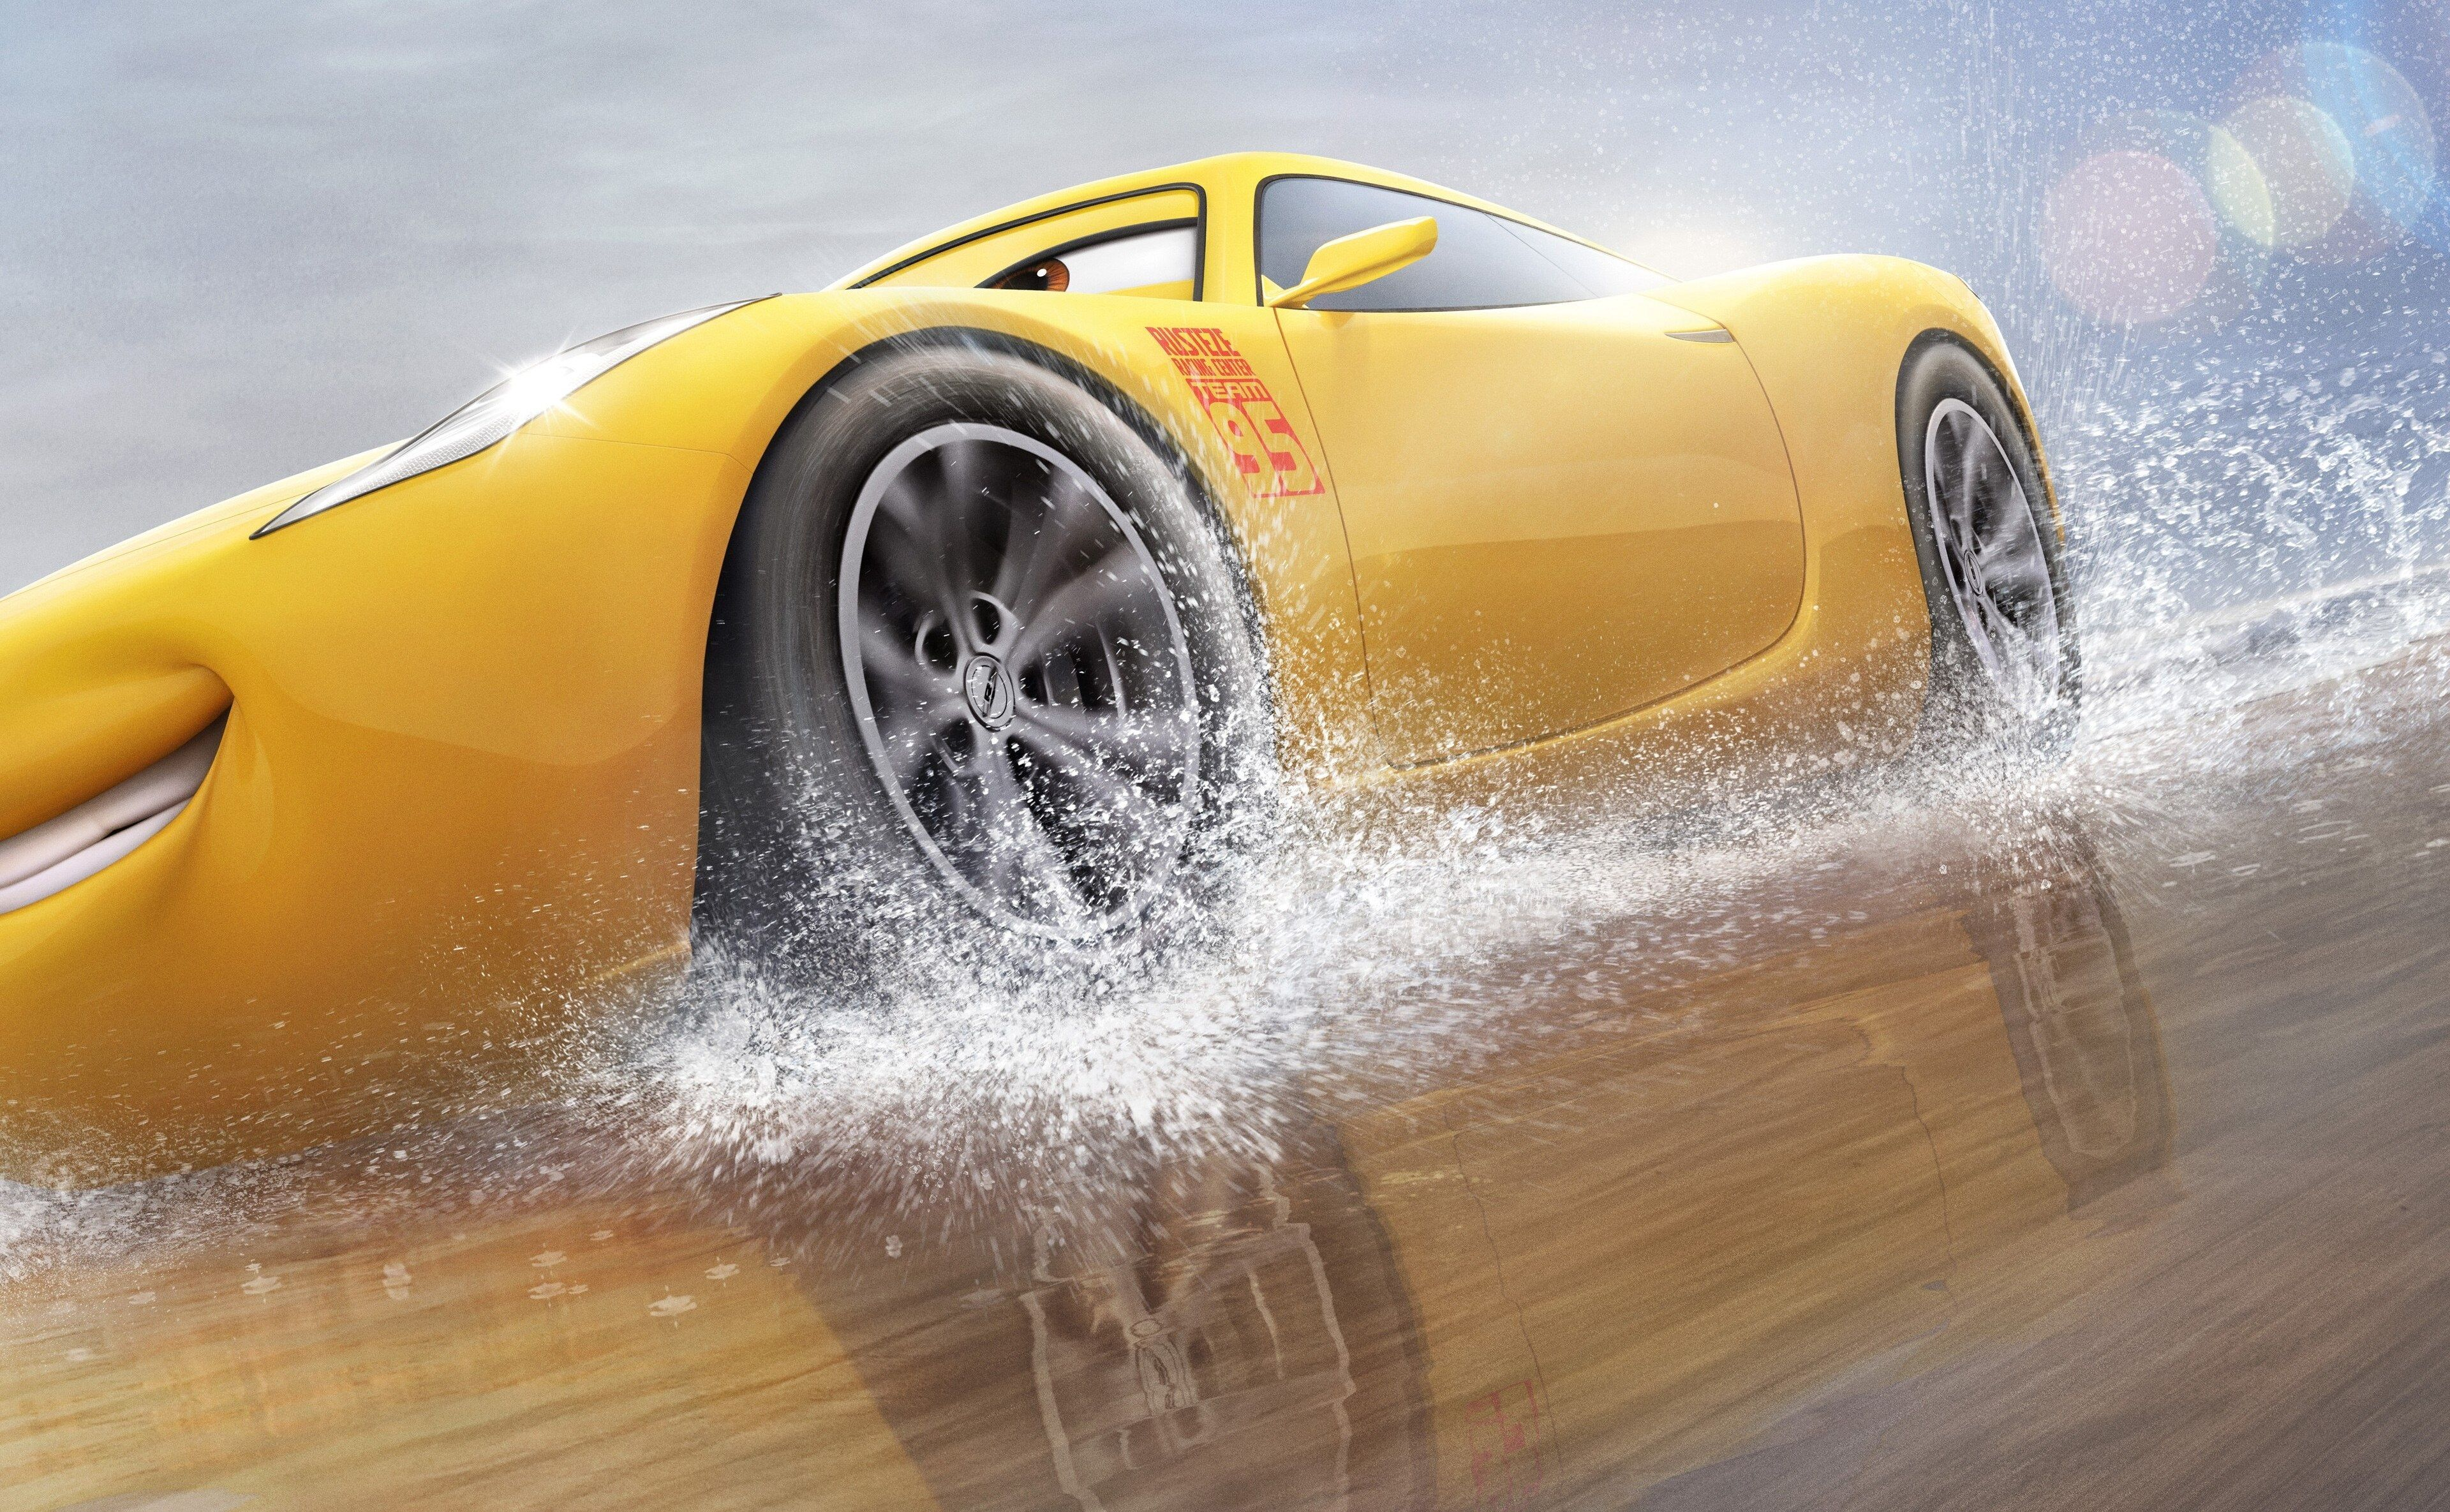 3840x2370 Cars 3 4k Desktop Wallpaper Hd Cruz Ramirez Disney Cars Wallpaper Cars Movie